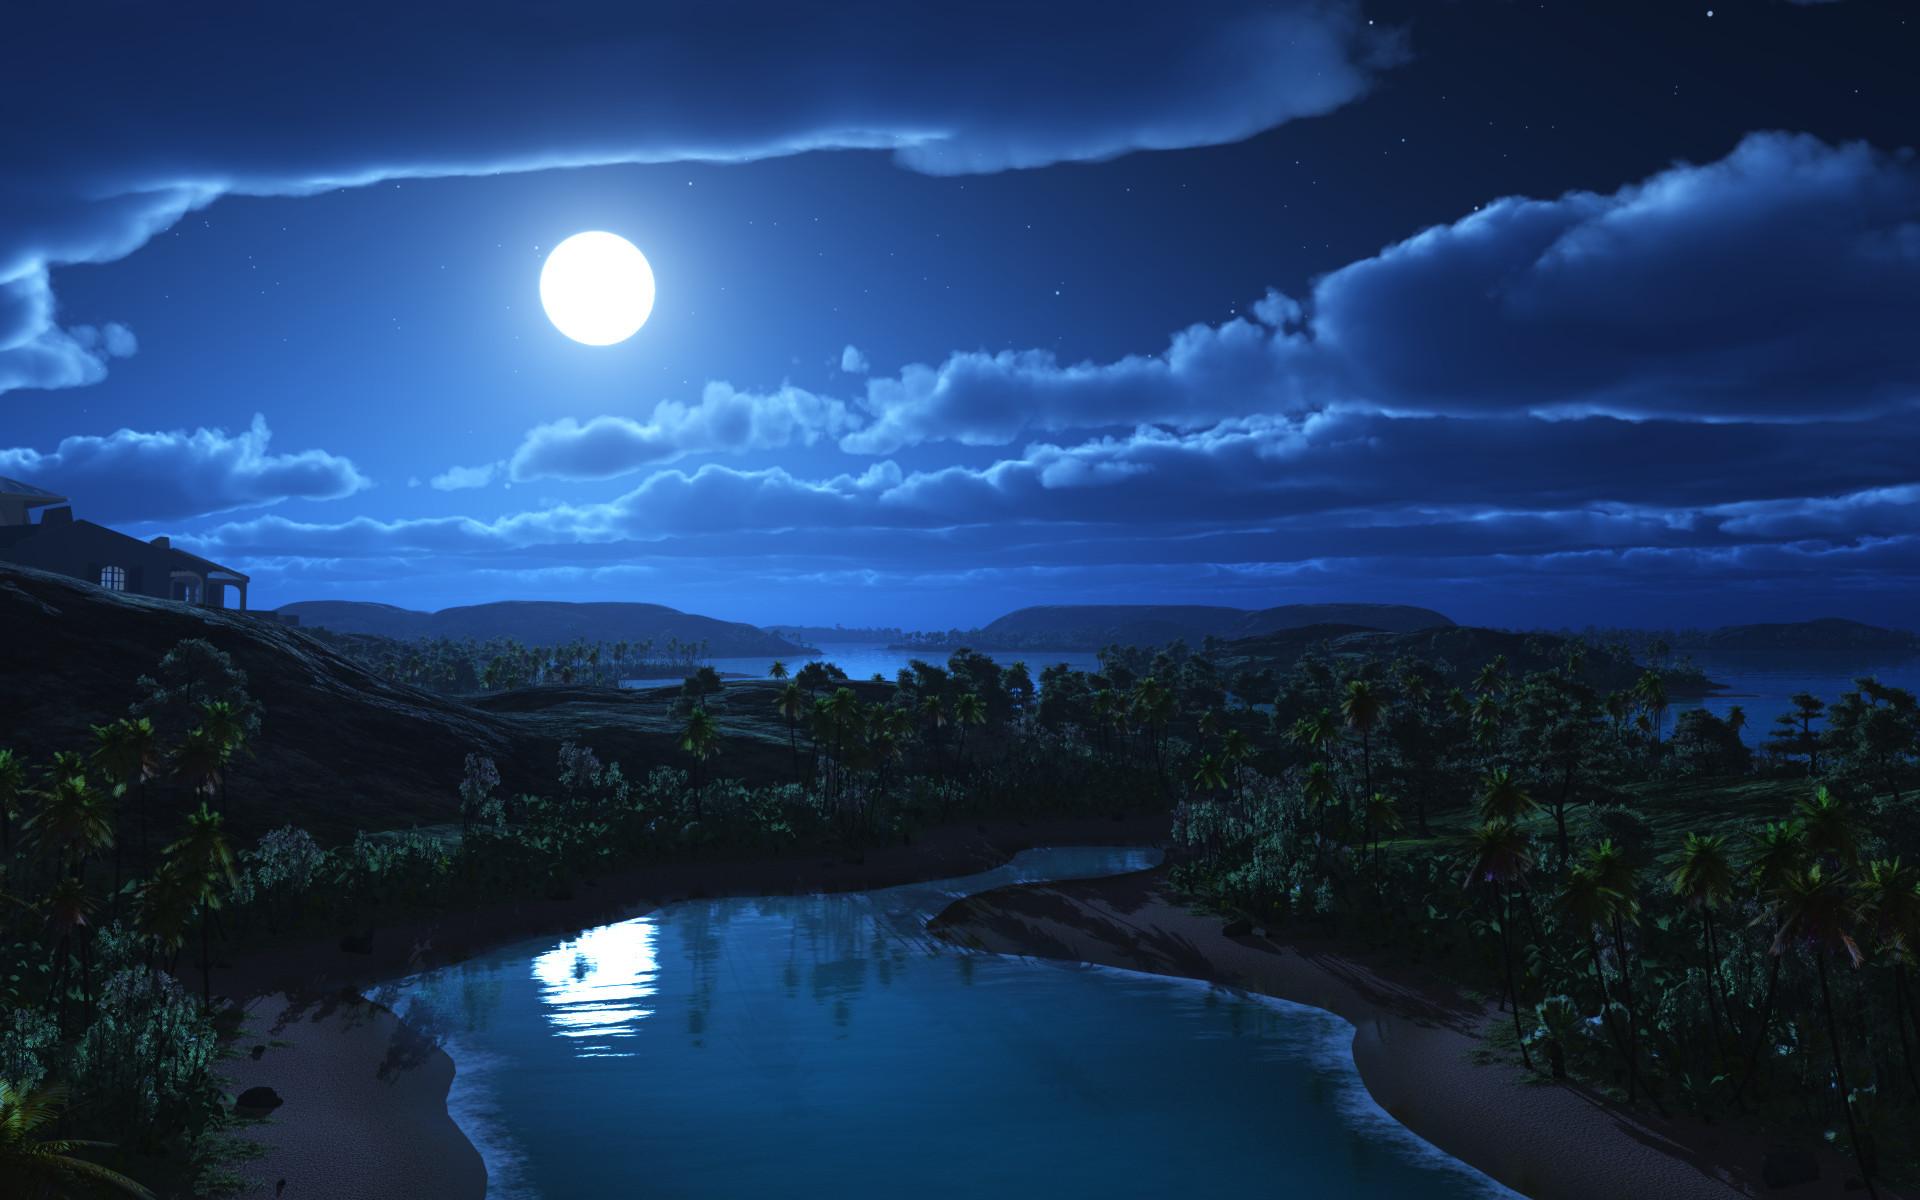 картинка обои ночь морю тирренкуру проходит